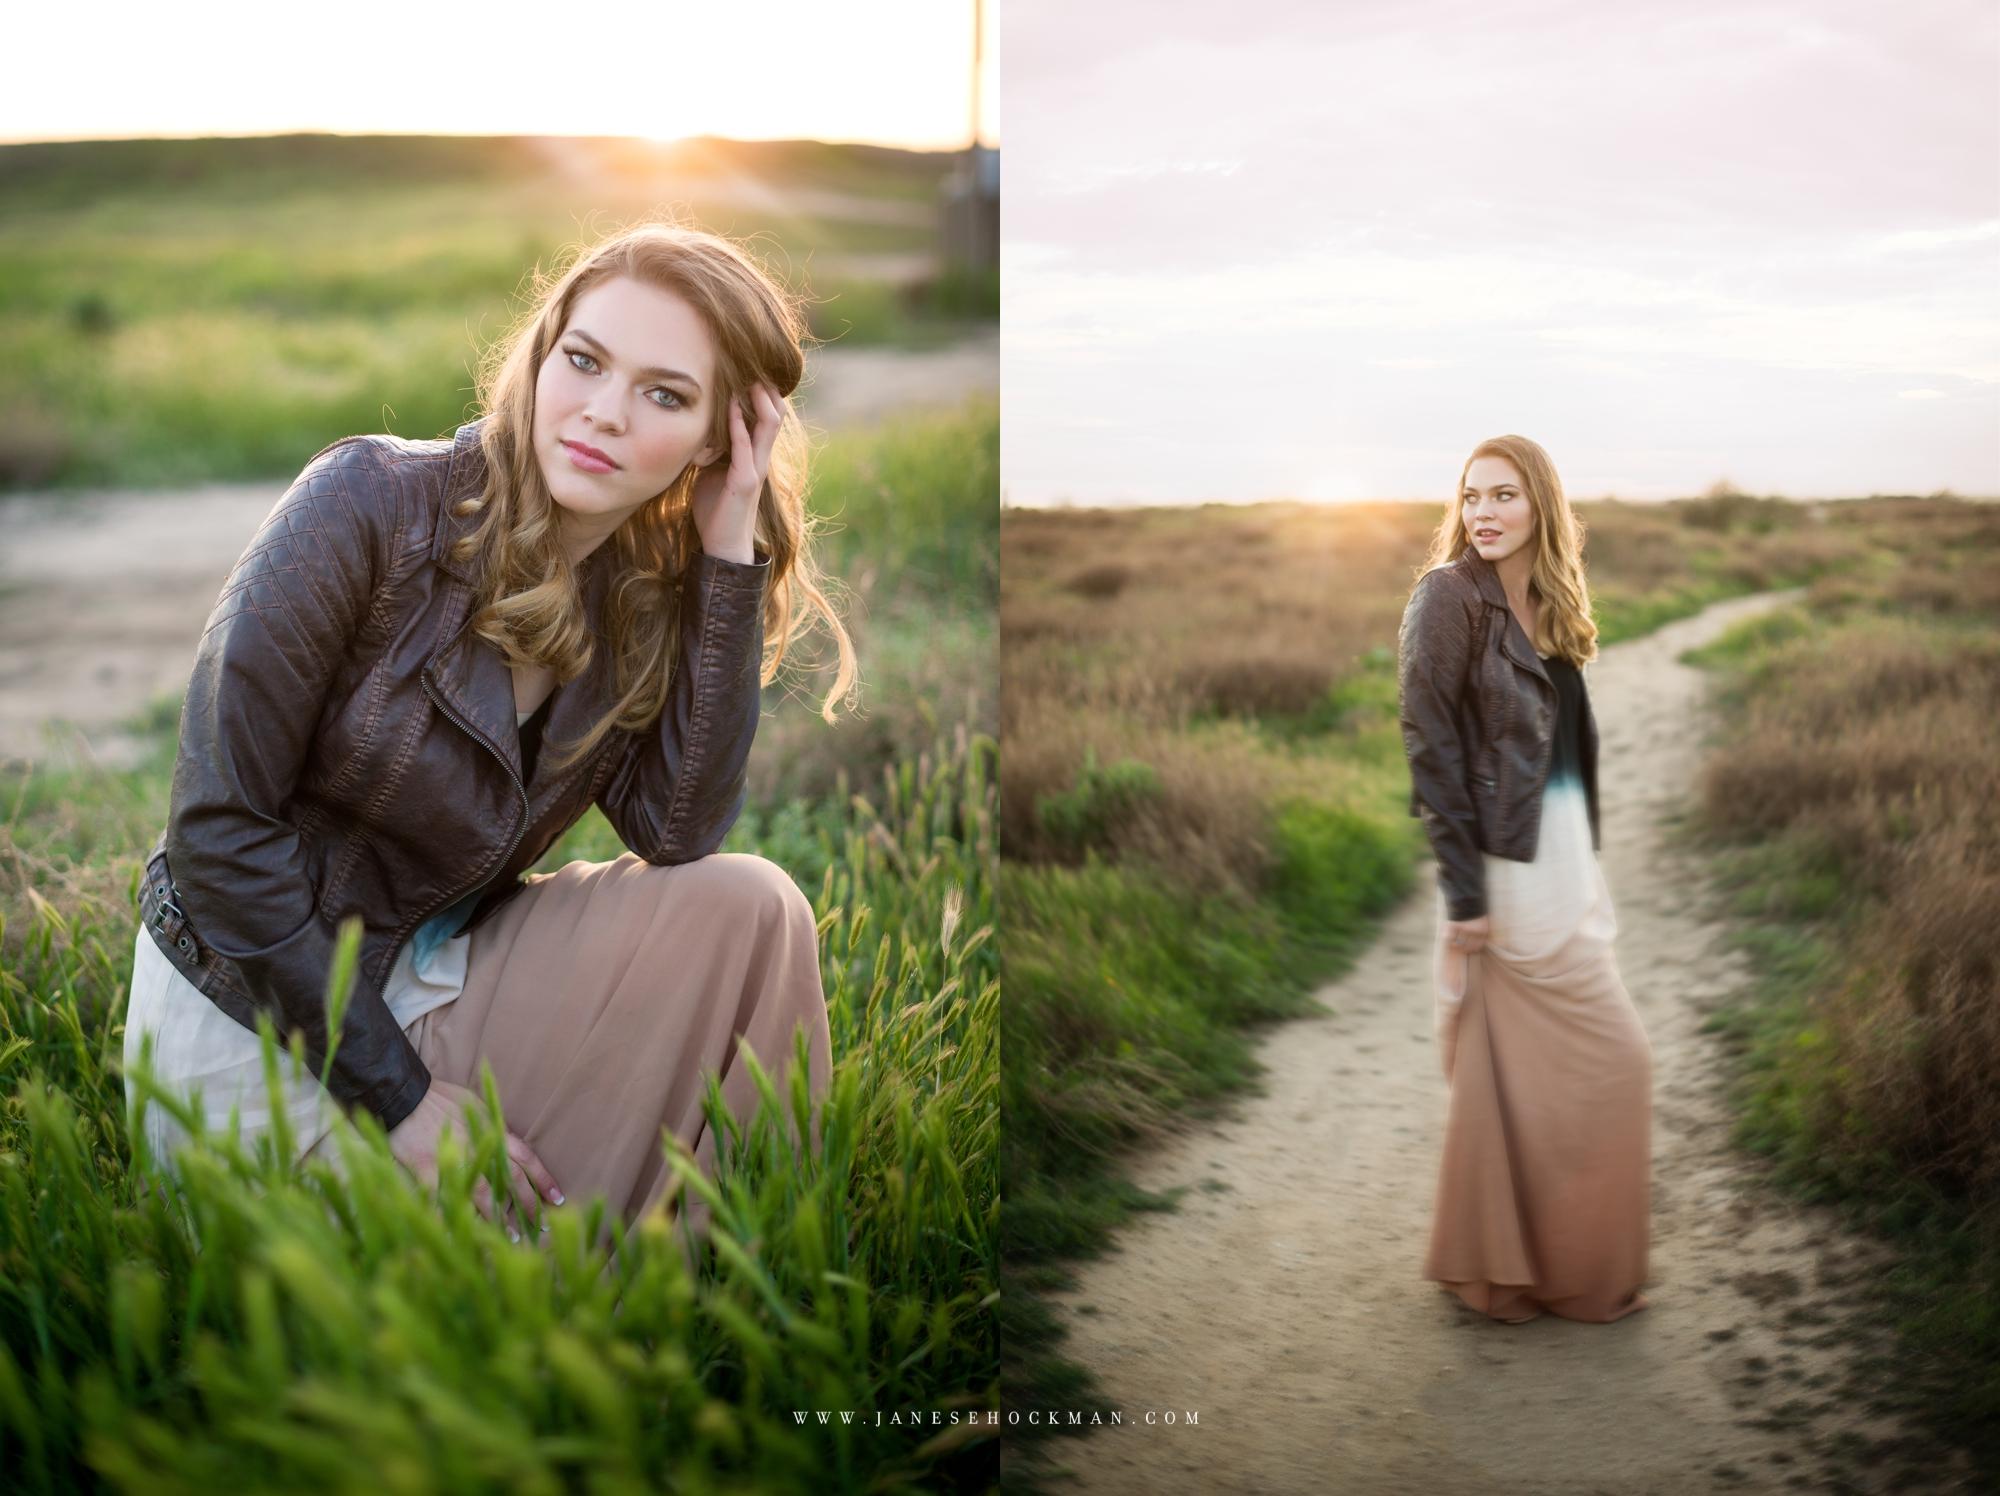 Holly   Janese Hockman Photography   San Luis Obispo, California   High School Senior Portraits   Huntington Beach 2.jpg